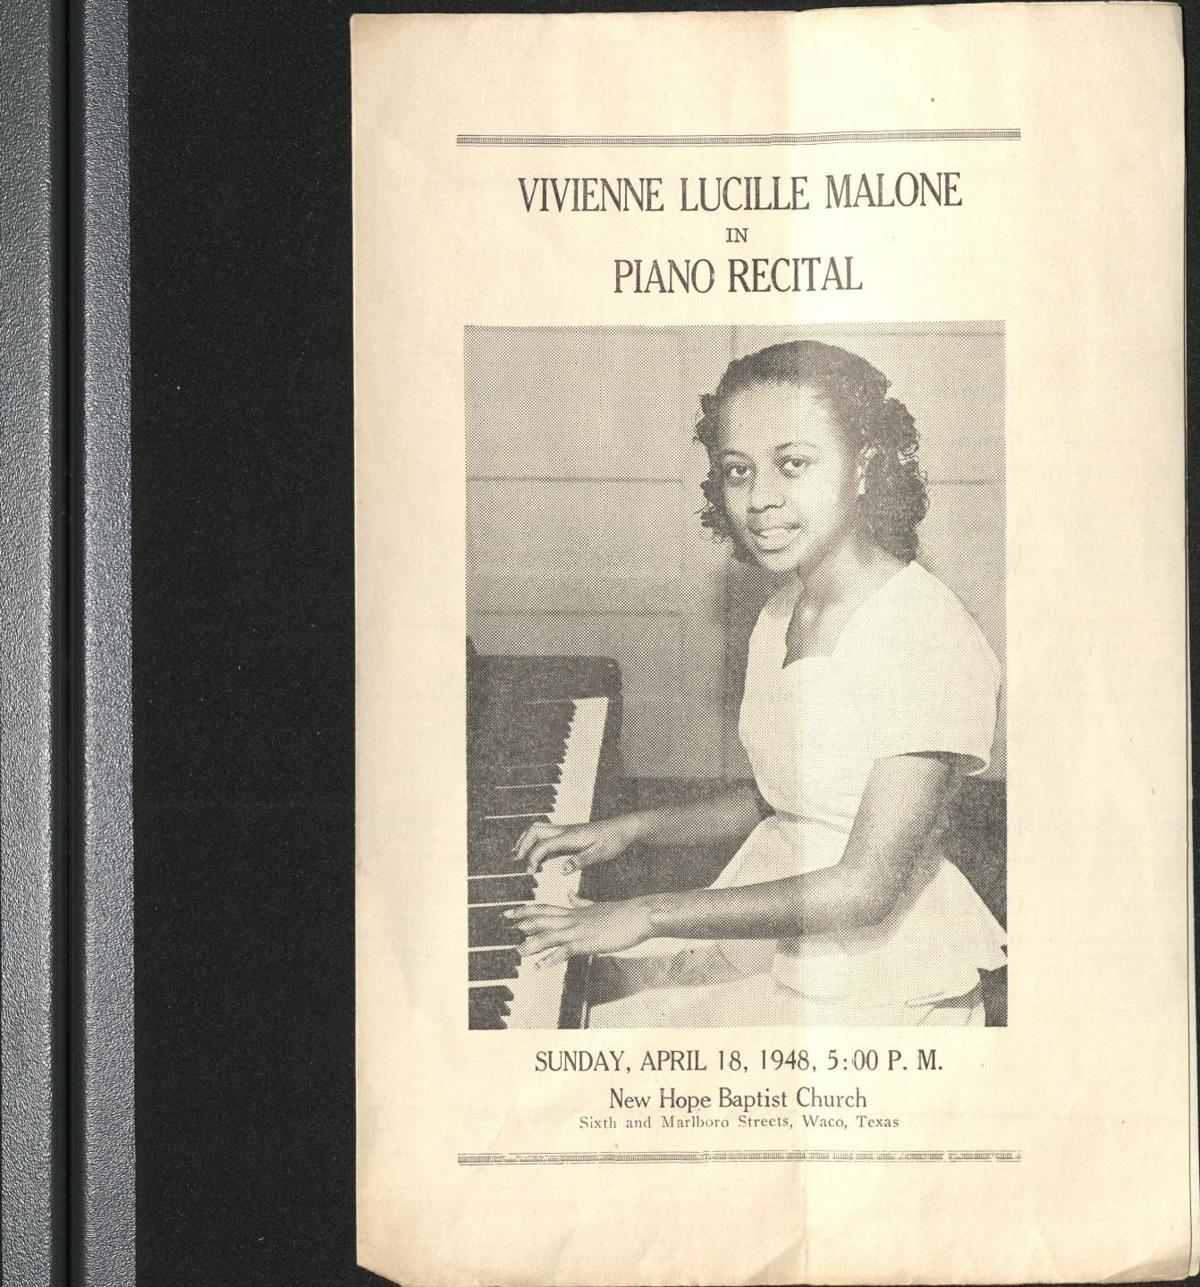 Vivienne Malone-Mayes piano recital program